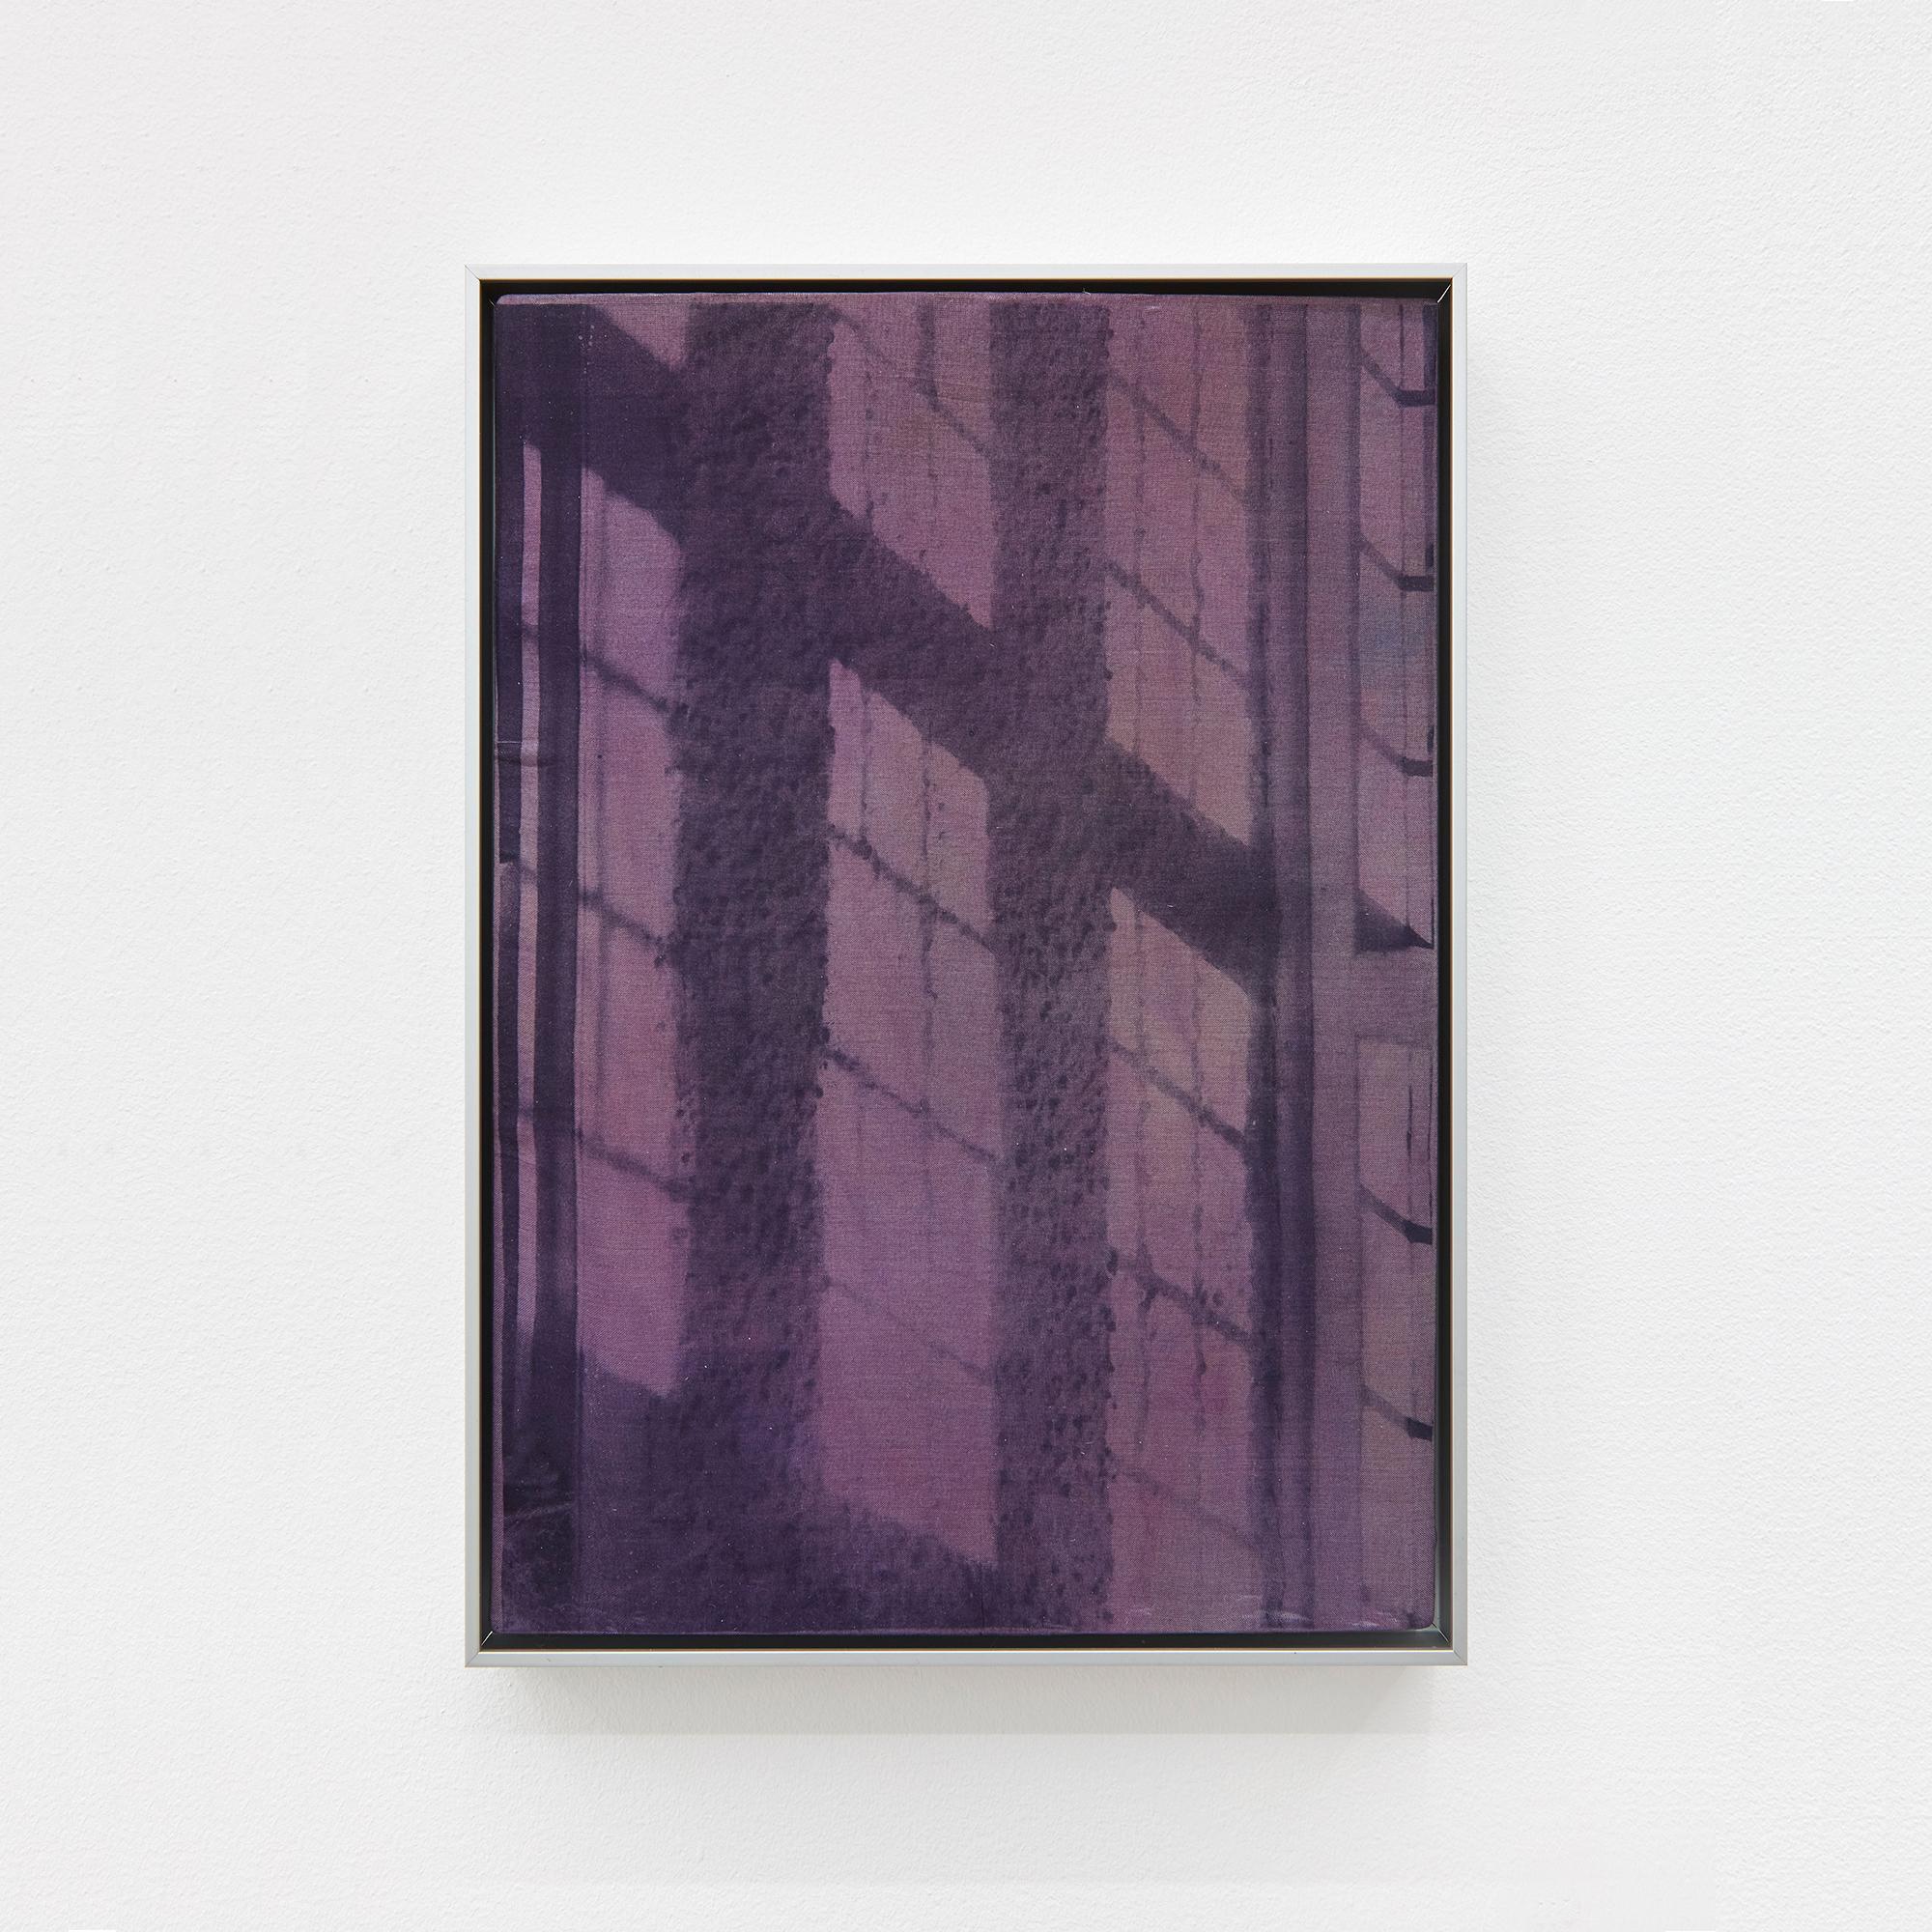 Nocturne, 2021. Oil on dyed silk, aluminium frame 25.5 x 19.5 cm